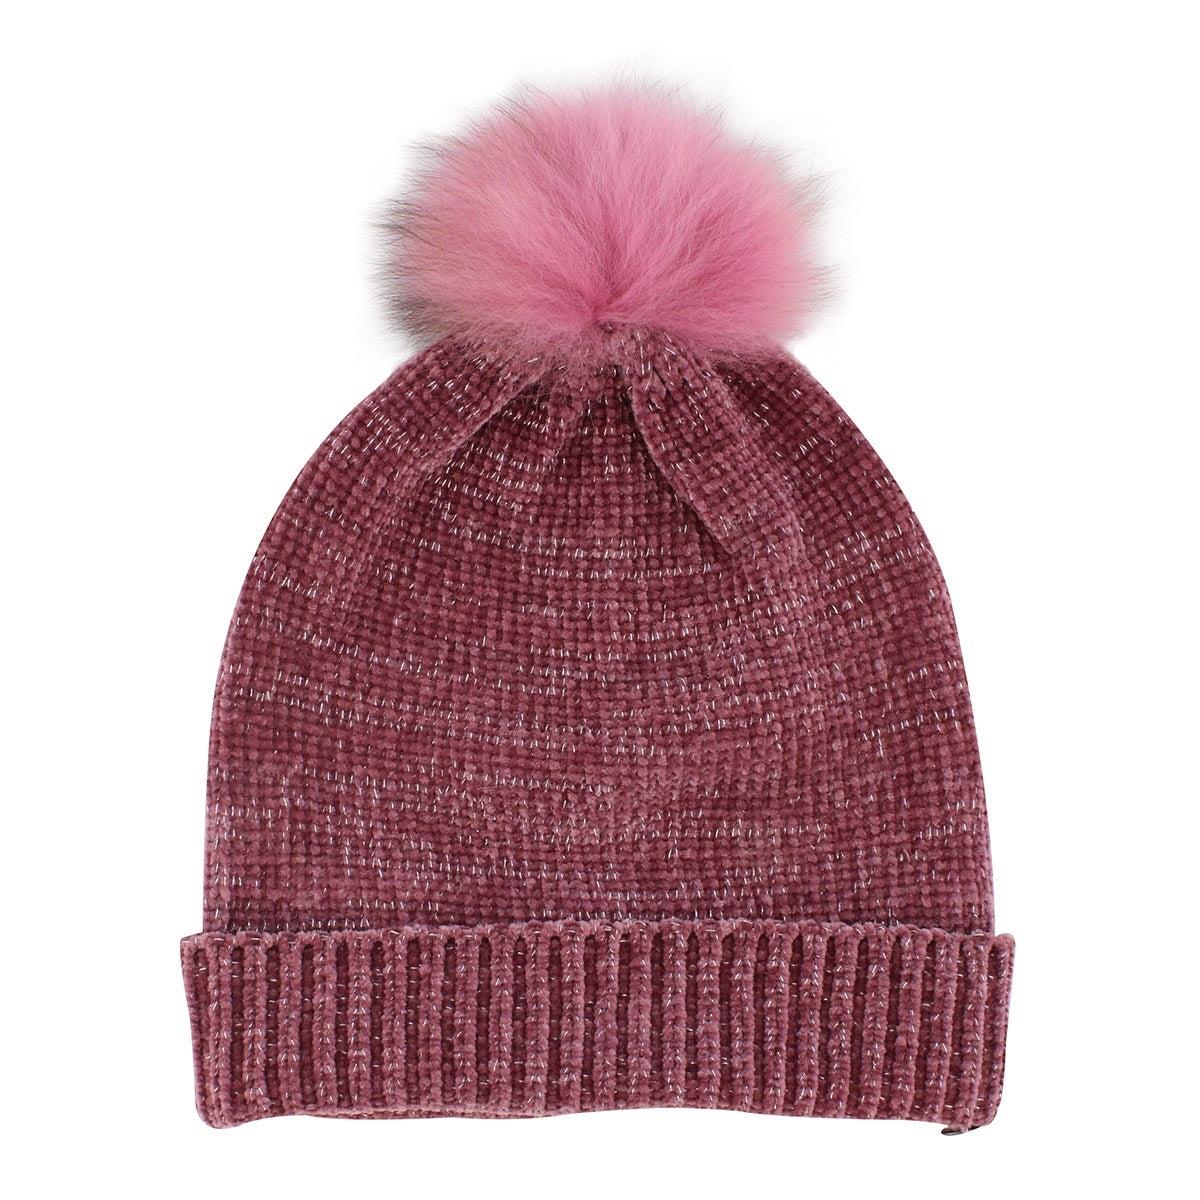 Lds Chenille Metallic Fur Pom plum hat